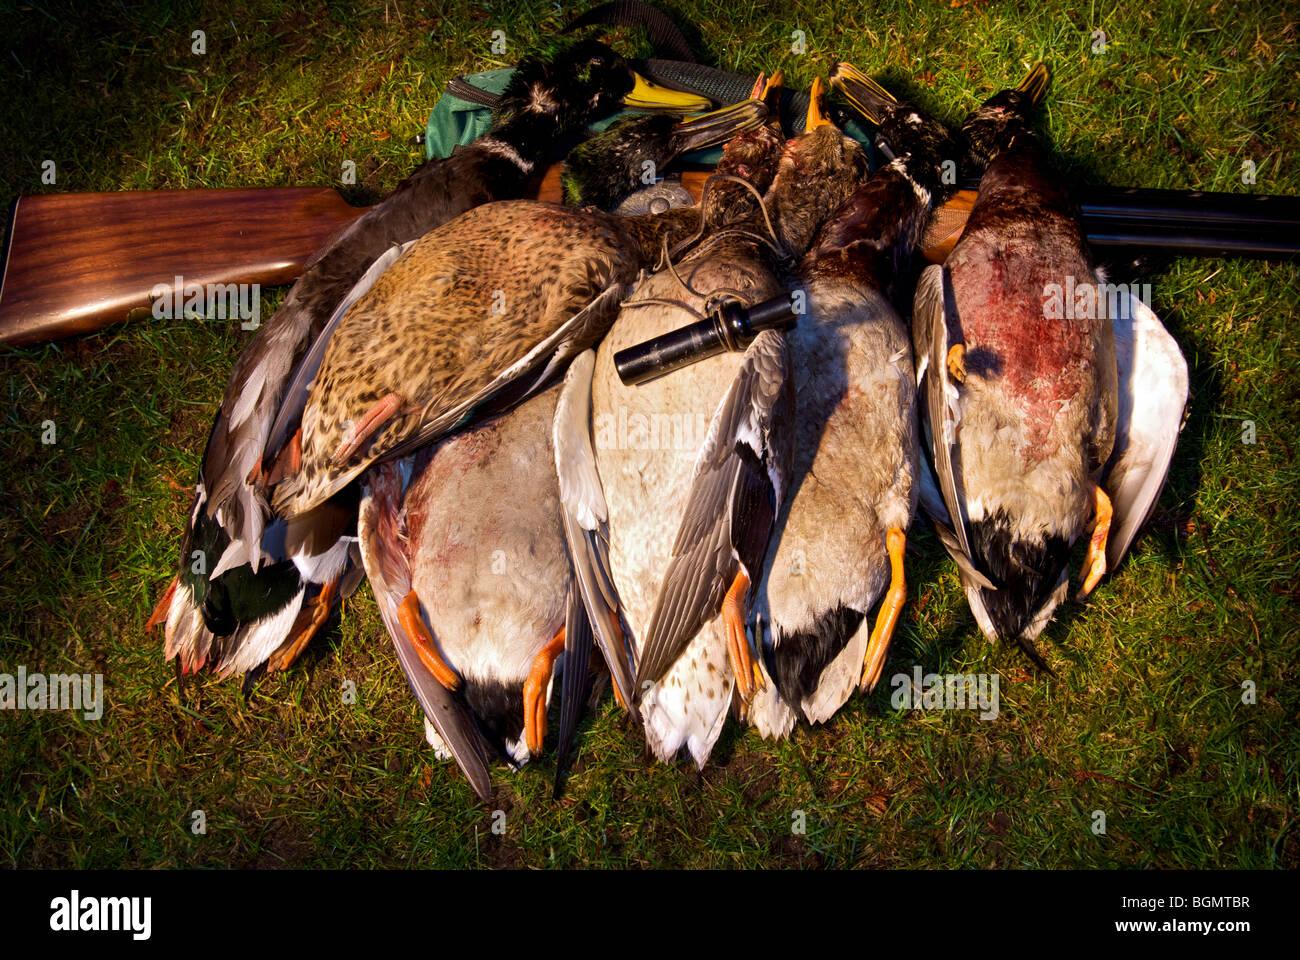 duck duck goose game instructions